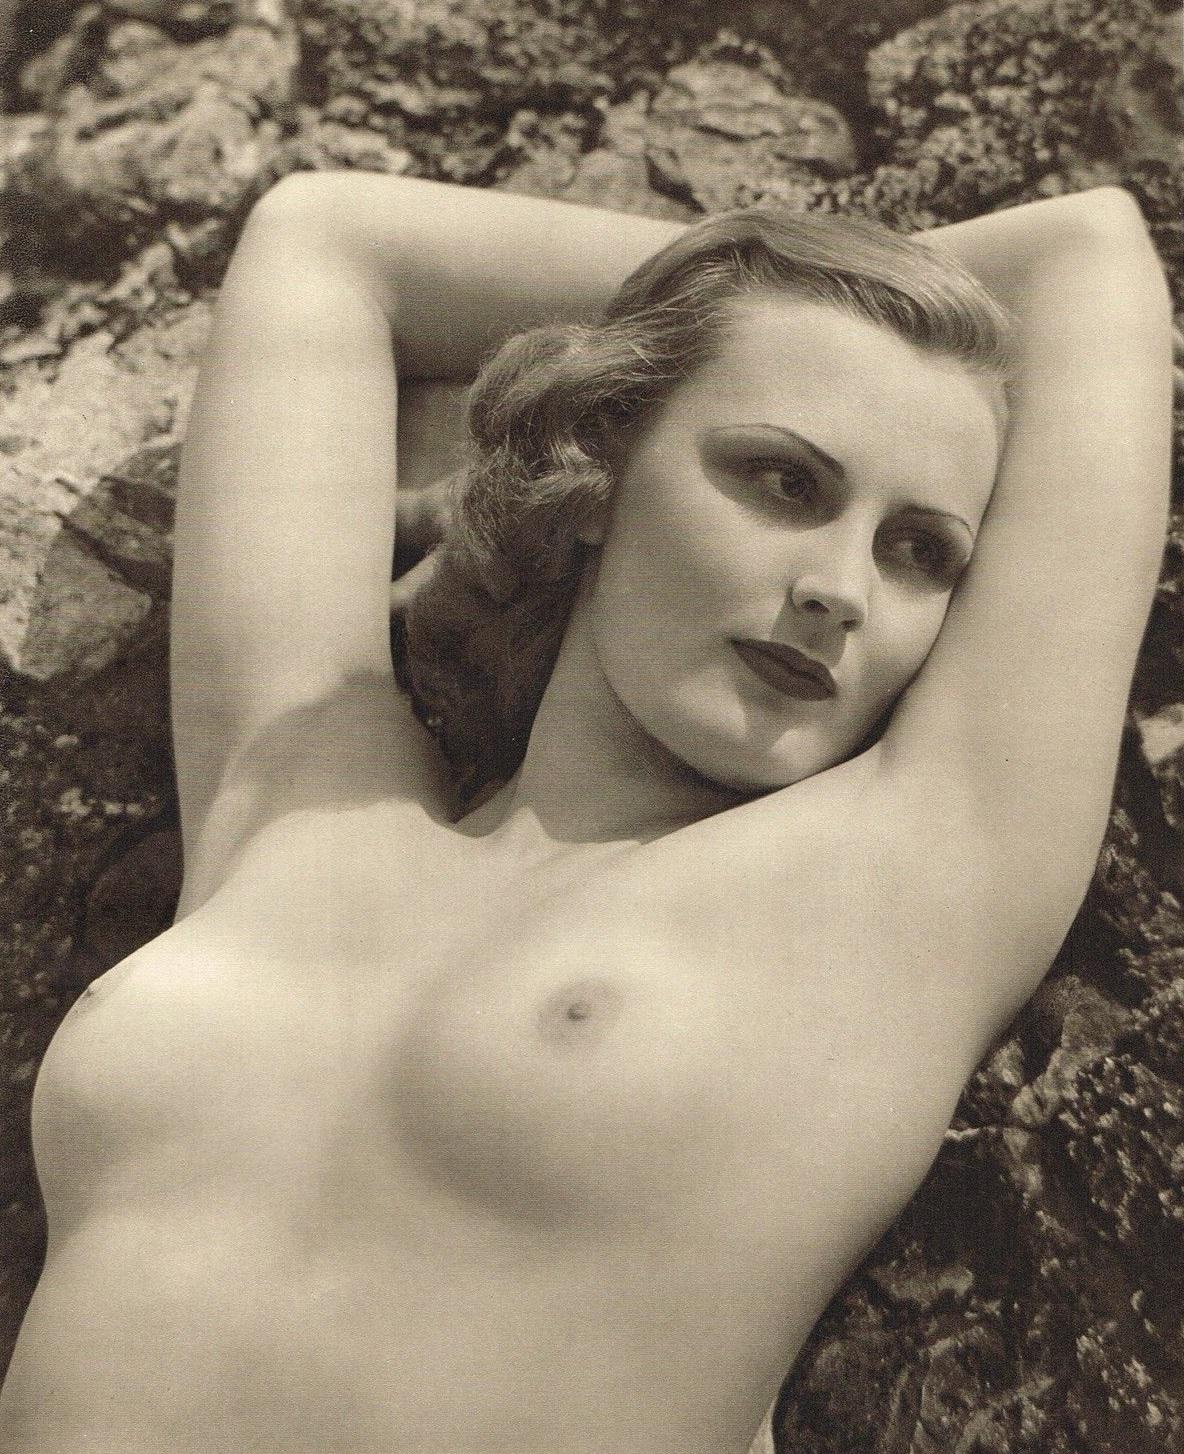 John Everard -Study of Nude (Nude Lady on Rocks) photogravure 1940